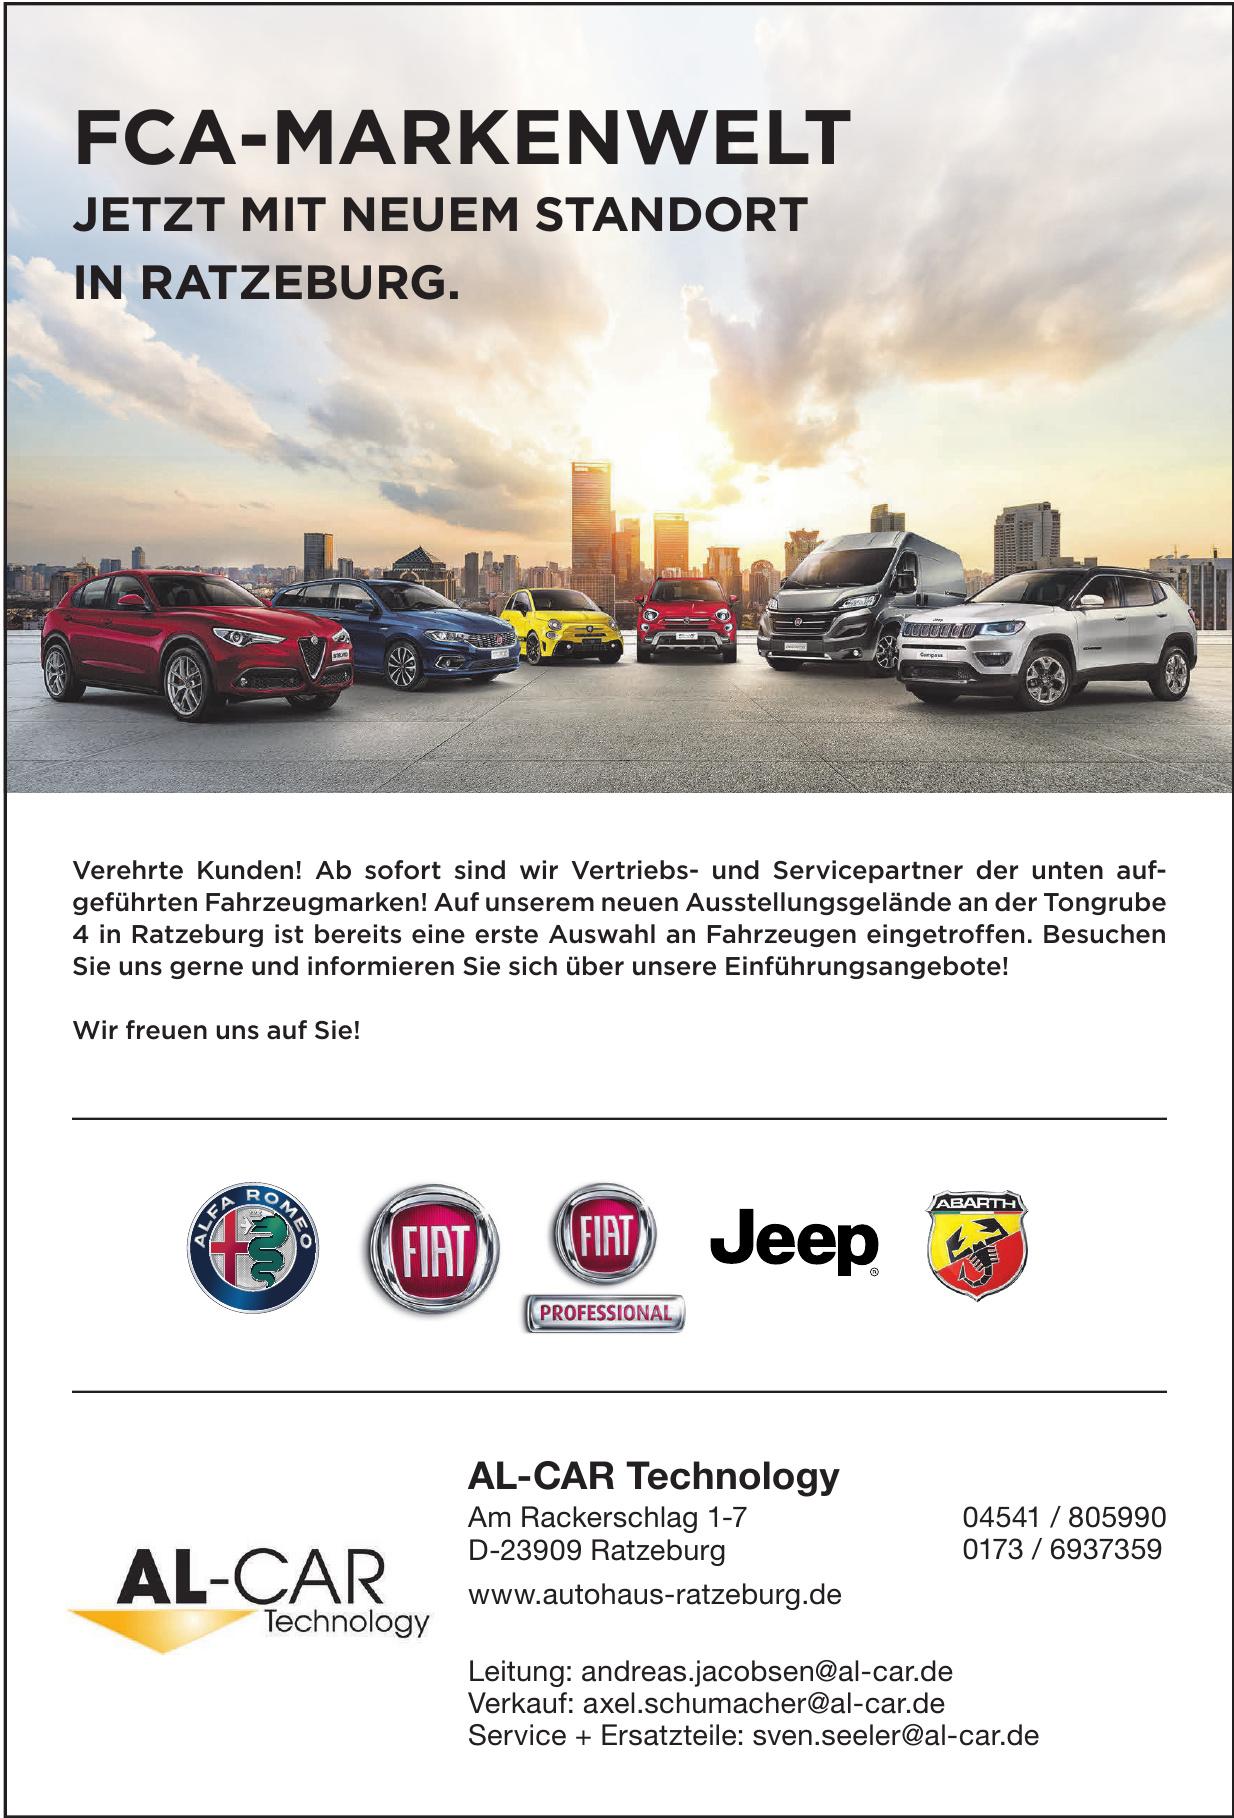 AL-CAR Technology